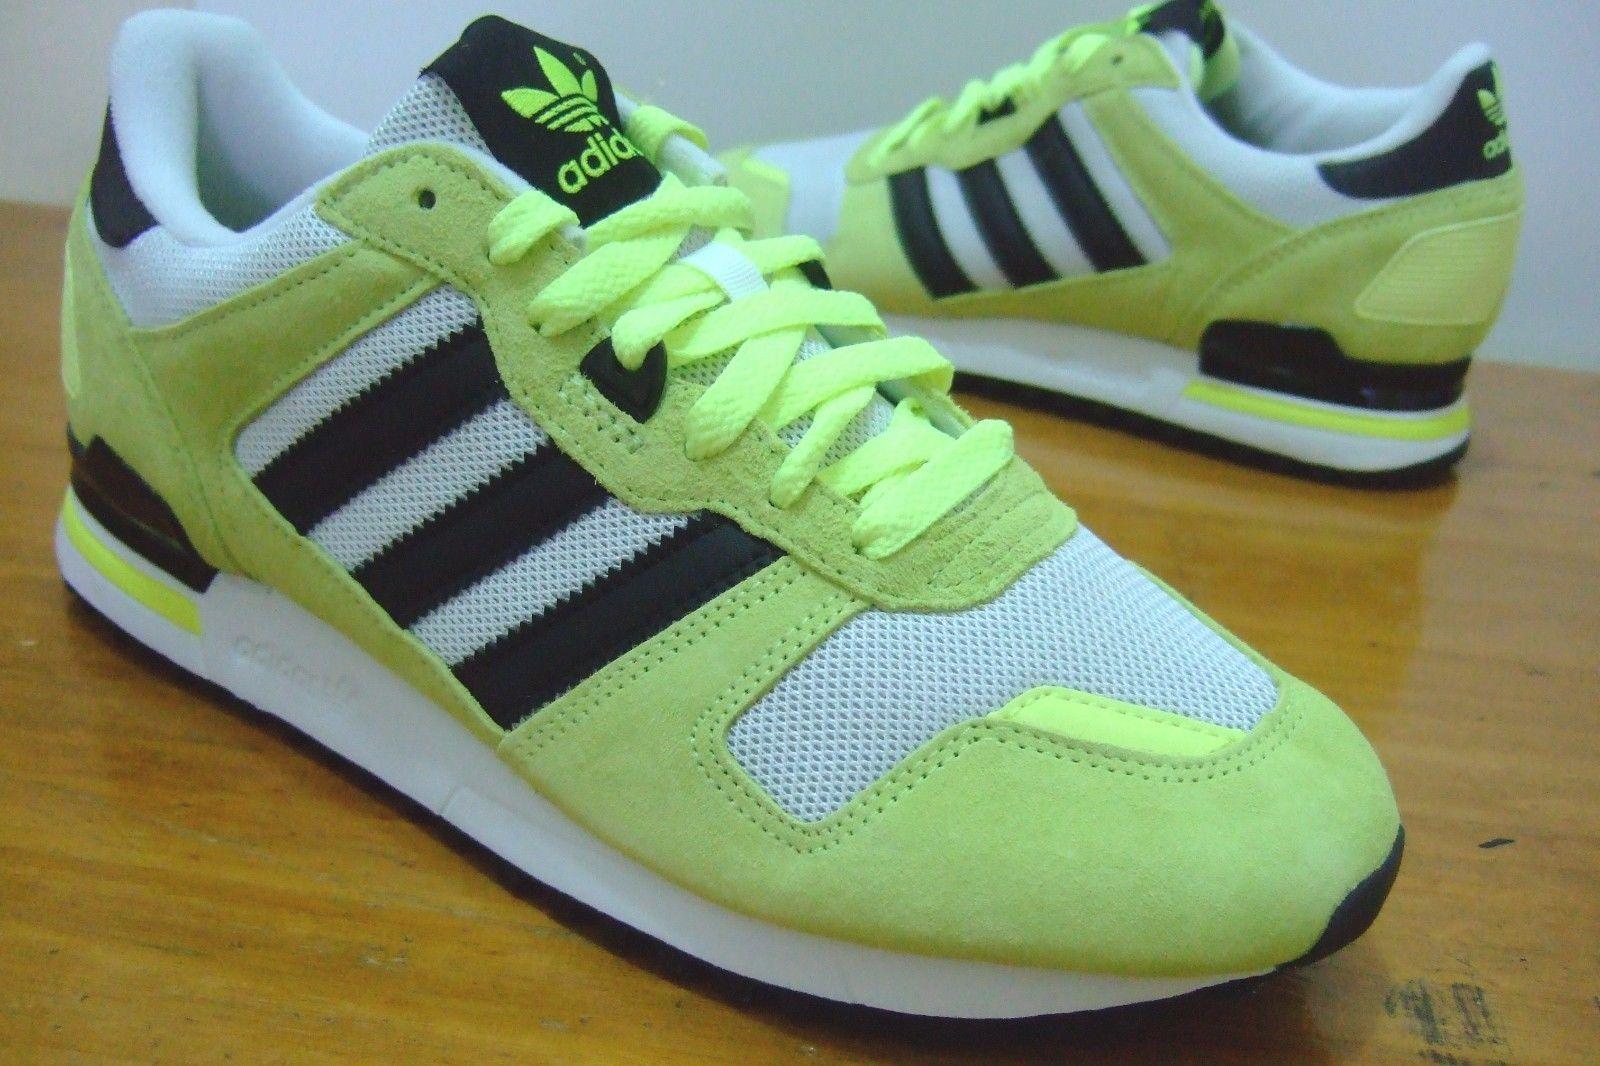 Adidas zx 700 retro stile retrò formatori pinterest sport